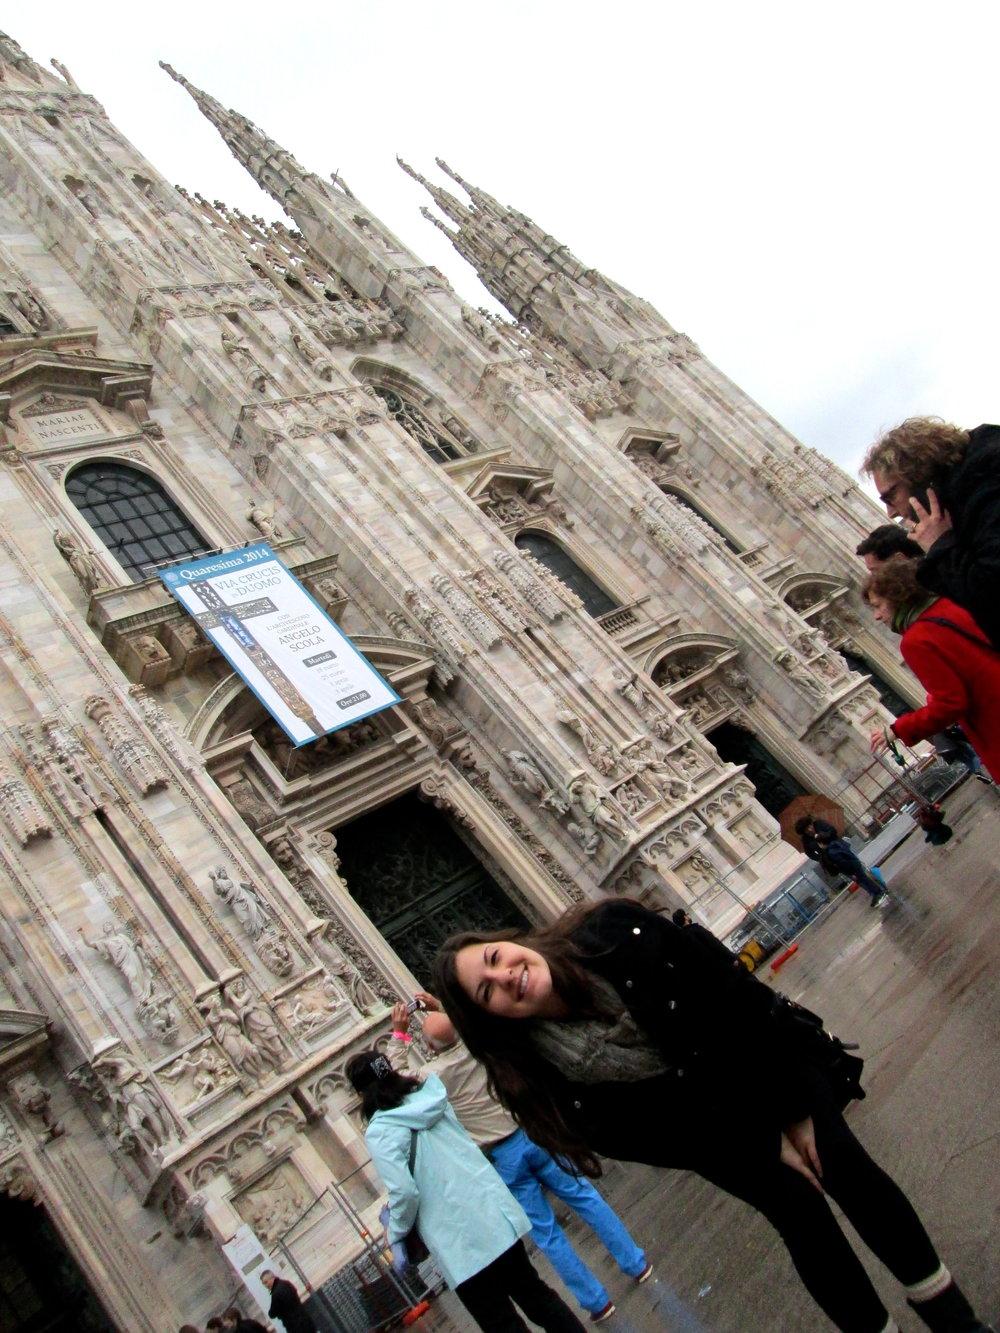 Duomo di Milano! My favorite site in Italy.